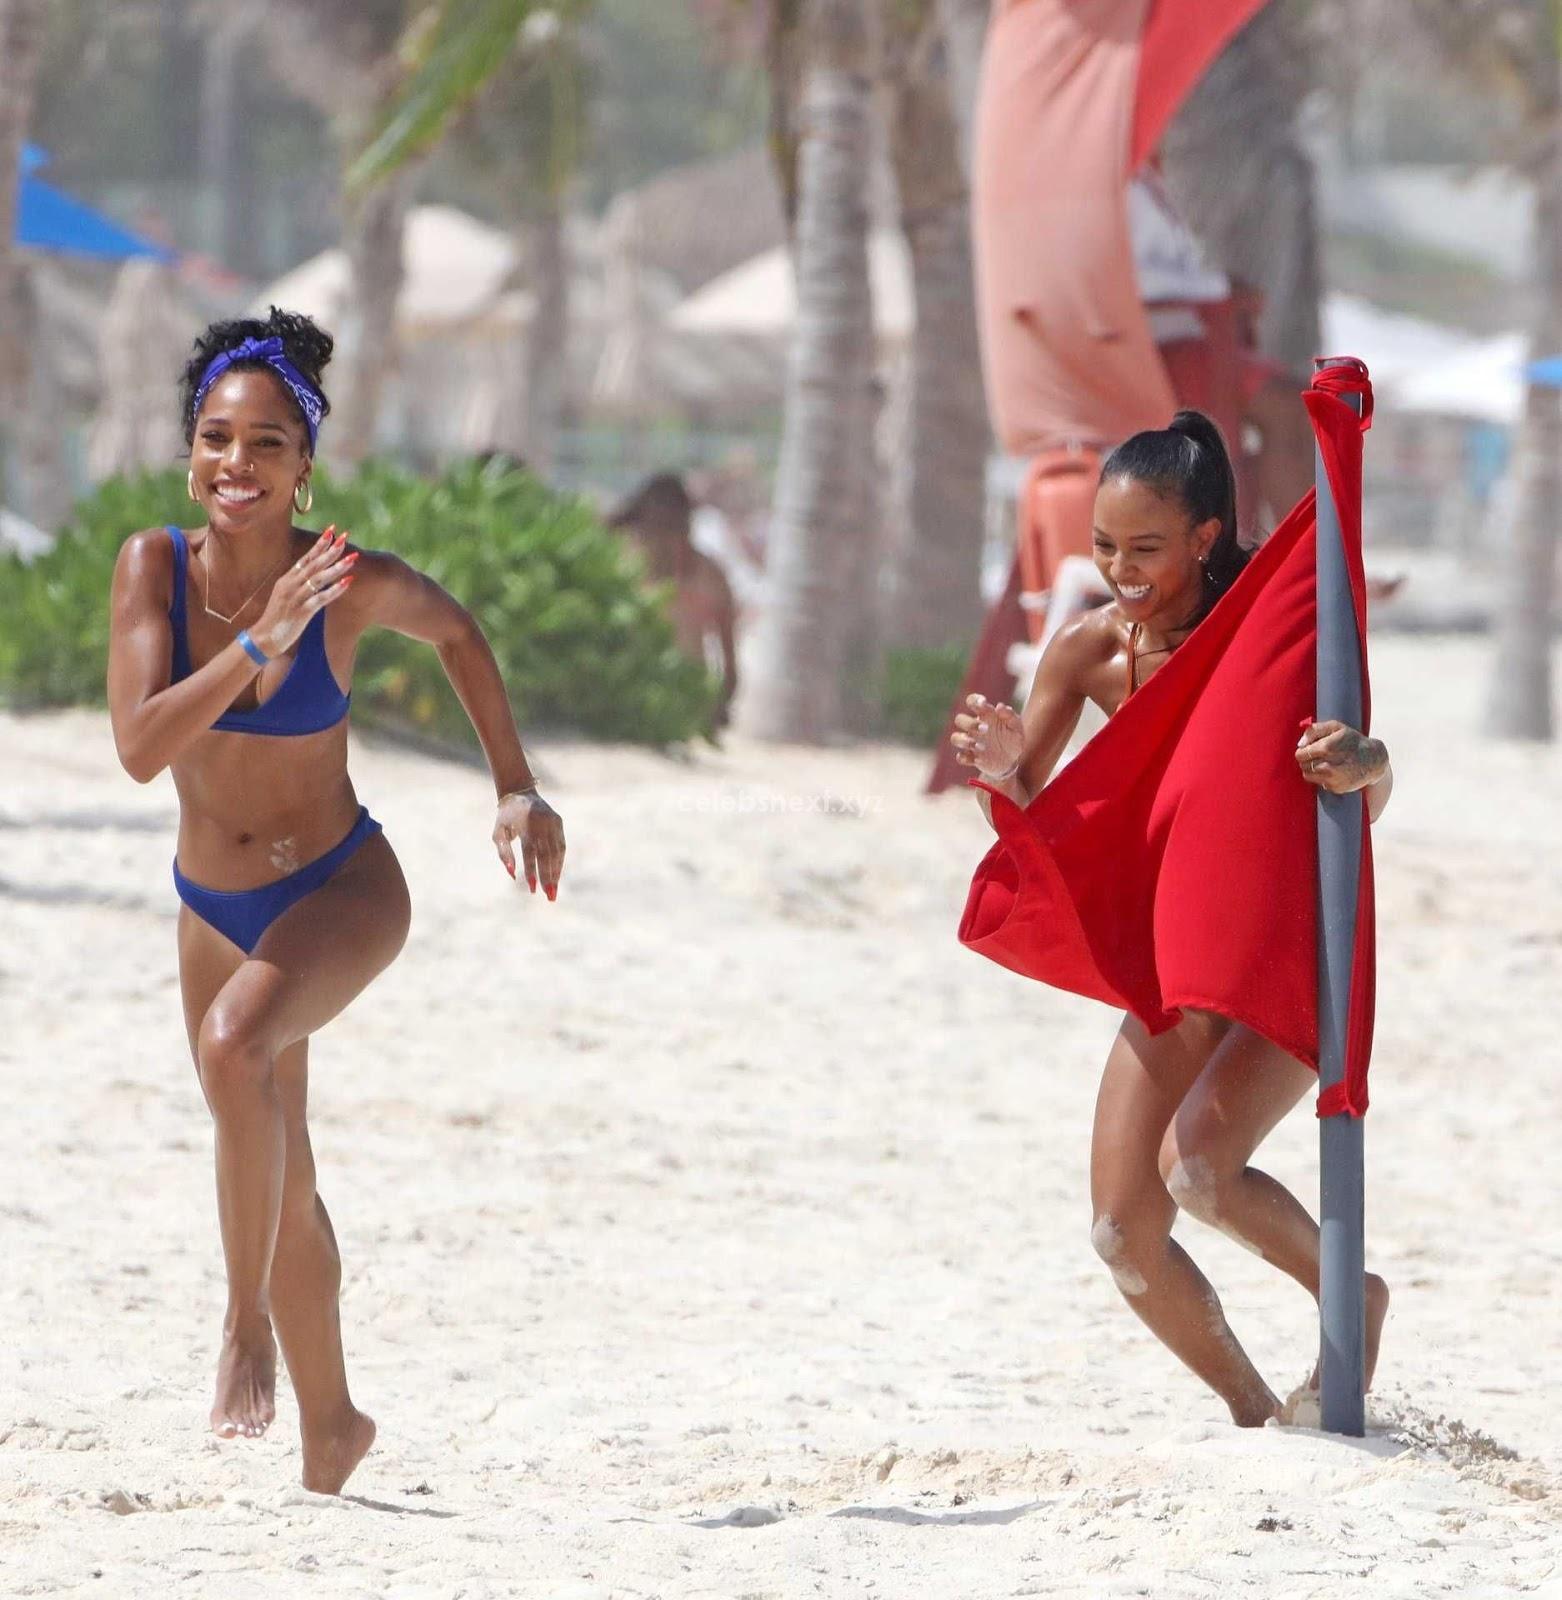 Karrueche Tran in Sexy Red Bikini Booty Beautiful Boobs ass July 2018 ~ CelebsNext.xyz Exclusive Celebrity Pics